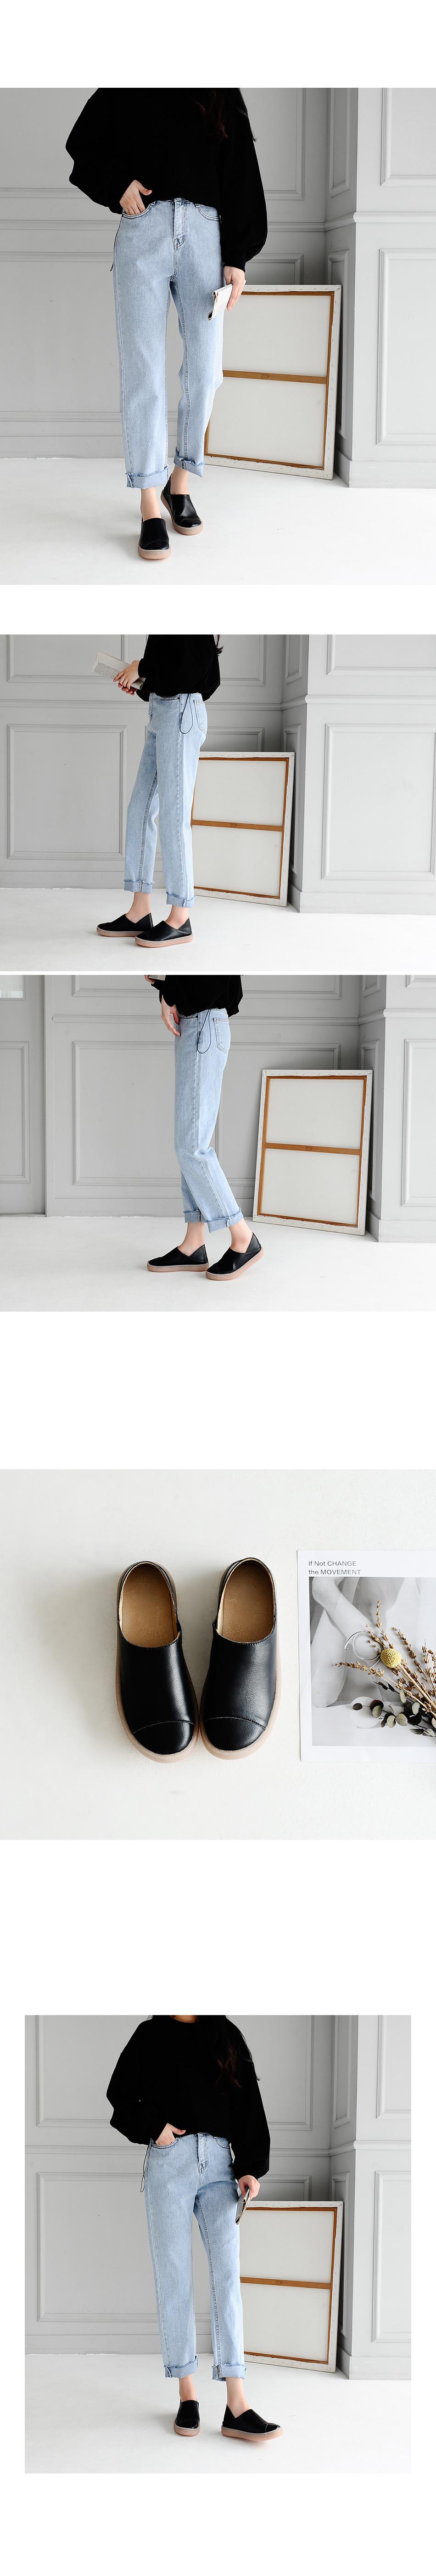 Mocha 2-Way Slip-on 2cm